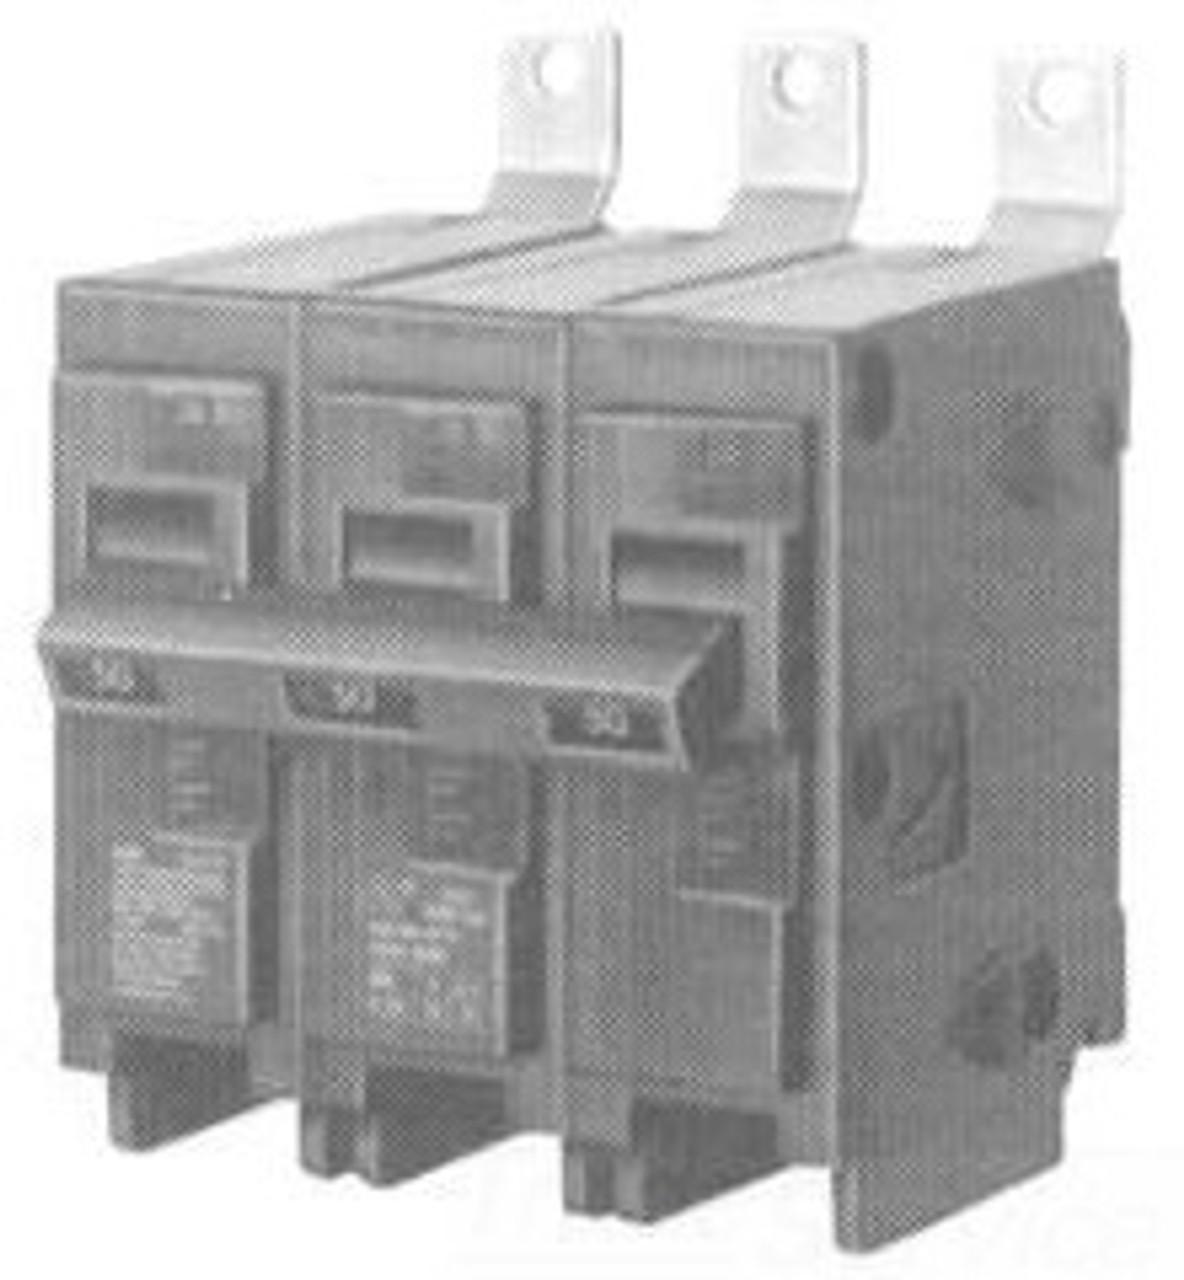 Siemens B370HH00S01 3 Pole 70 Amp 240V 65K Shunt Trip Type BL Circuit Breaker - NPO